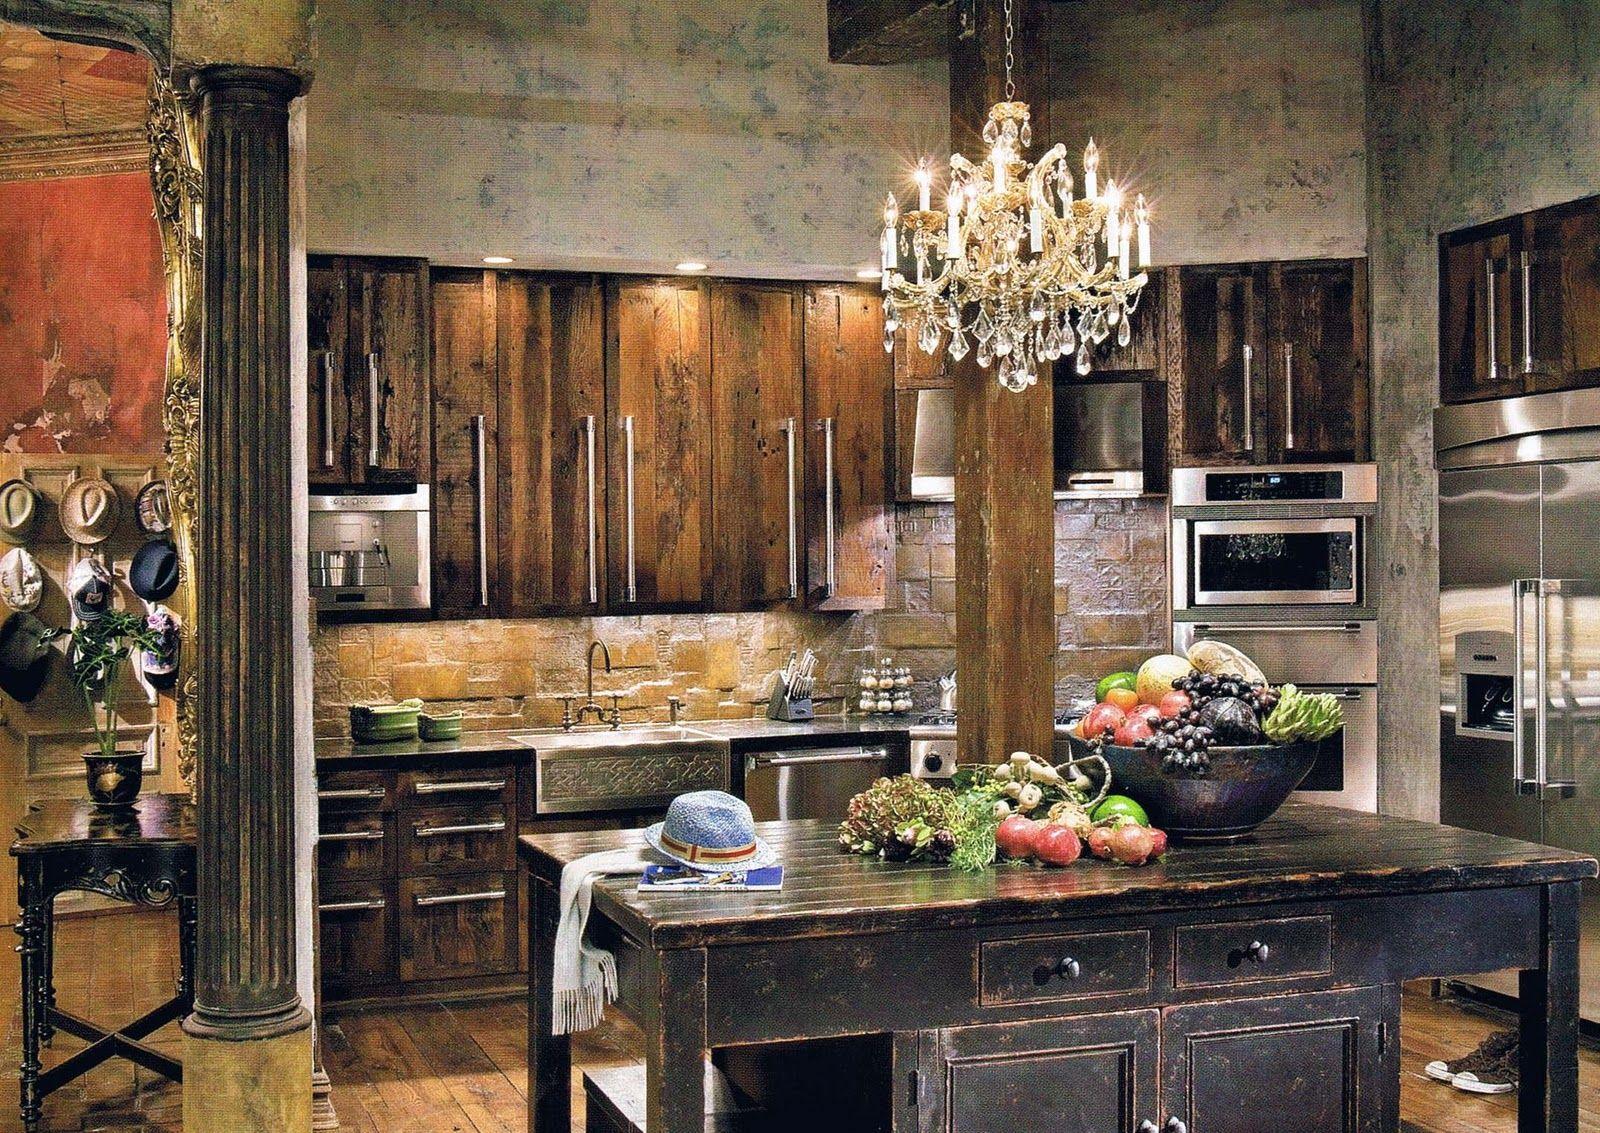 Modern Rustic. Gerard Butler's Home. Interior Design By